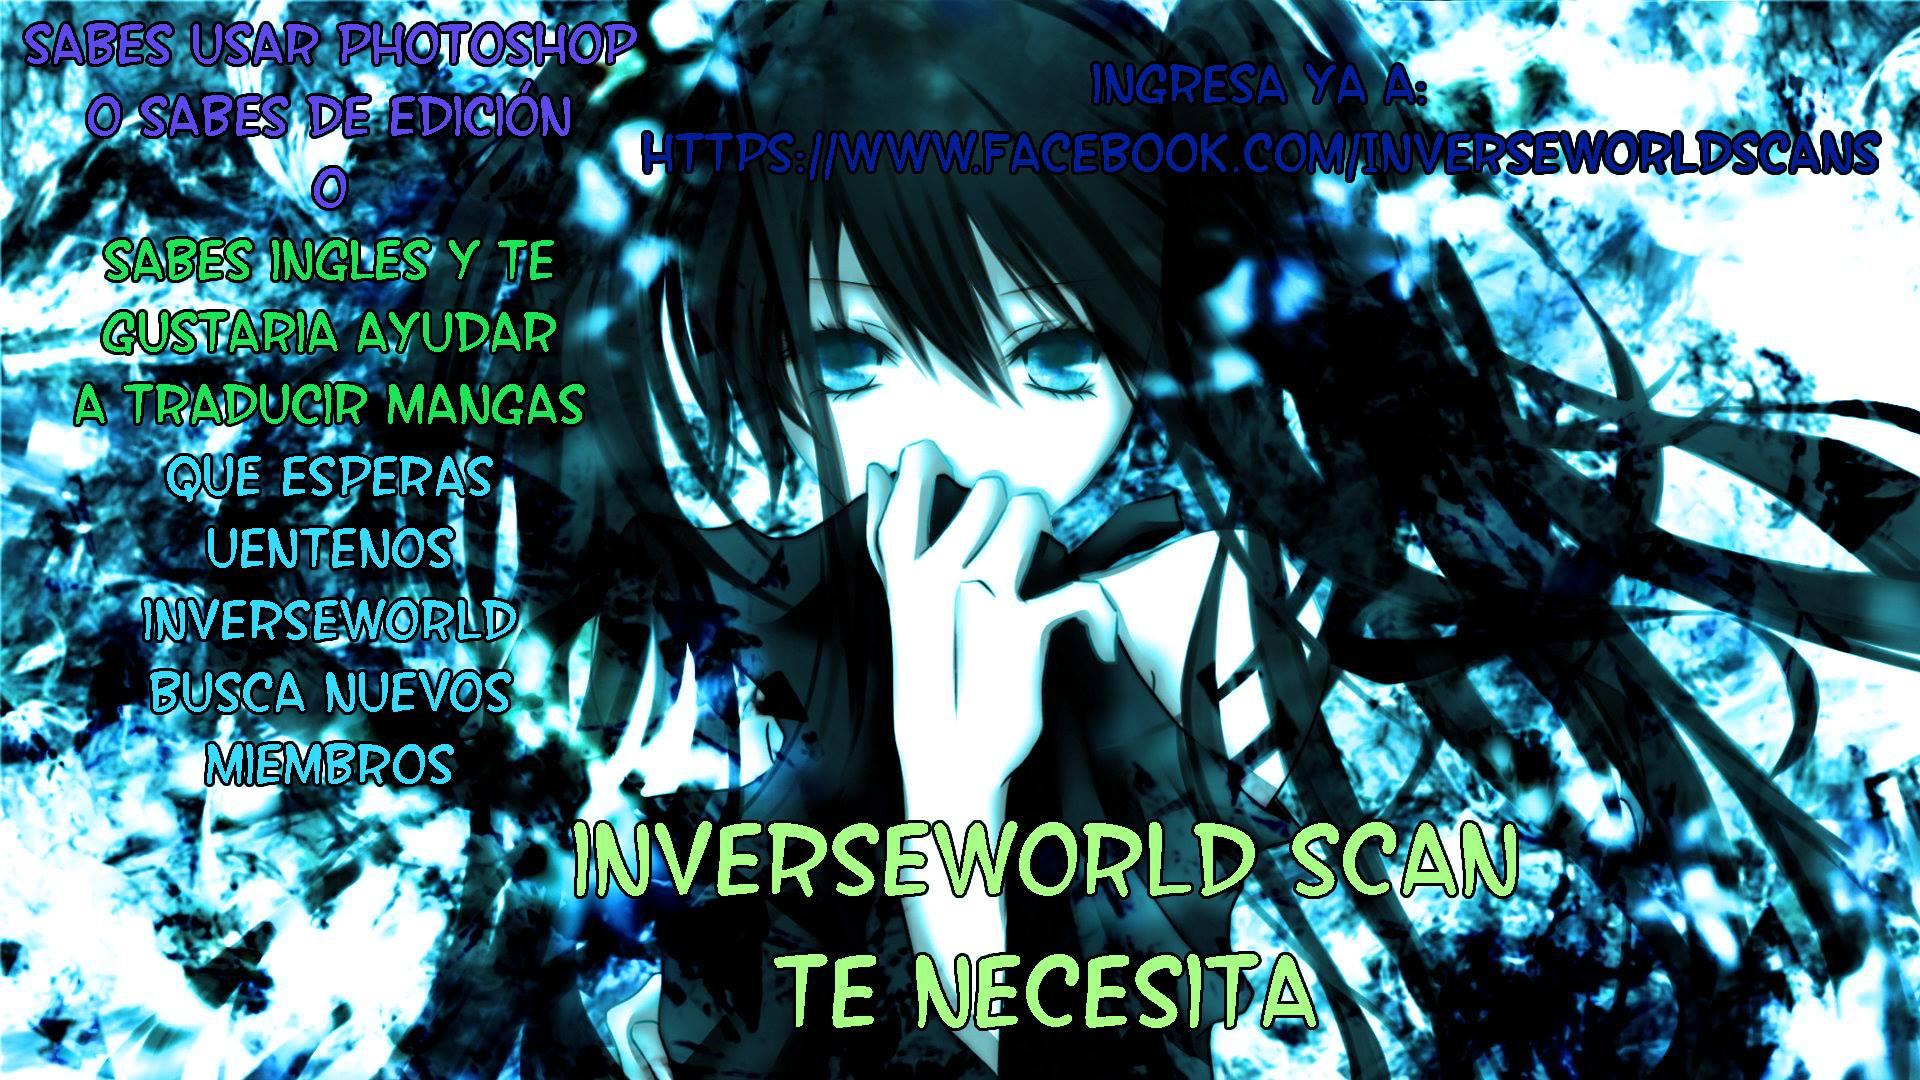 http://c5.ninemanga.com/es_manga/18/16210/415292/3f8eabe32f7ac2713a9724d5c1914cf7.jpg Page 1